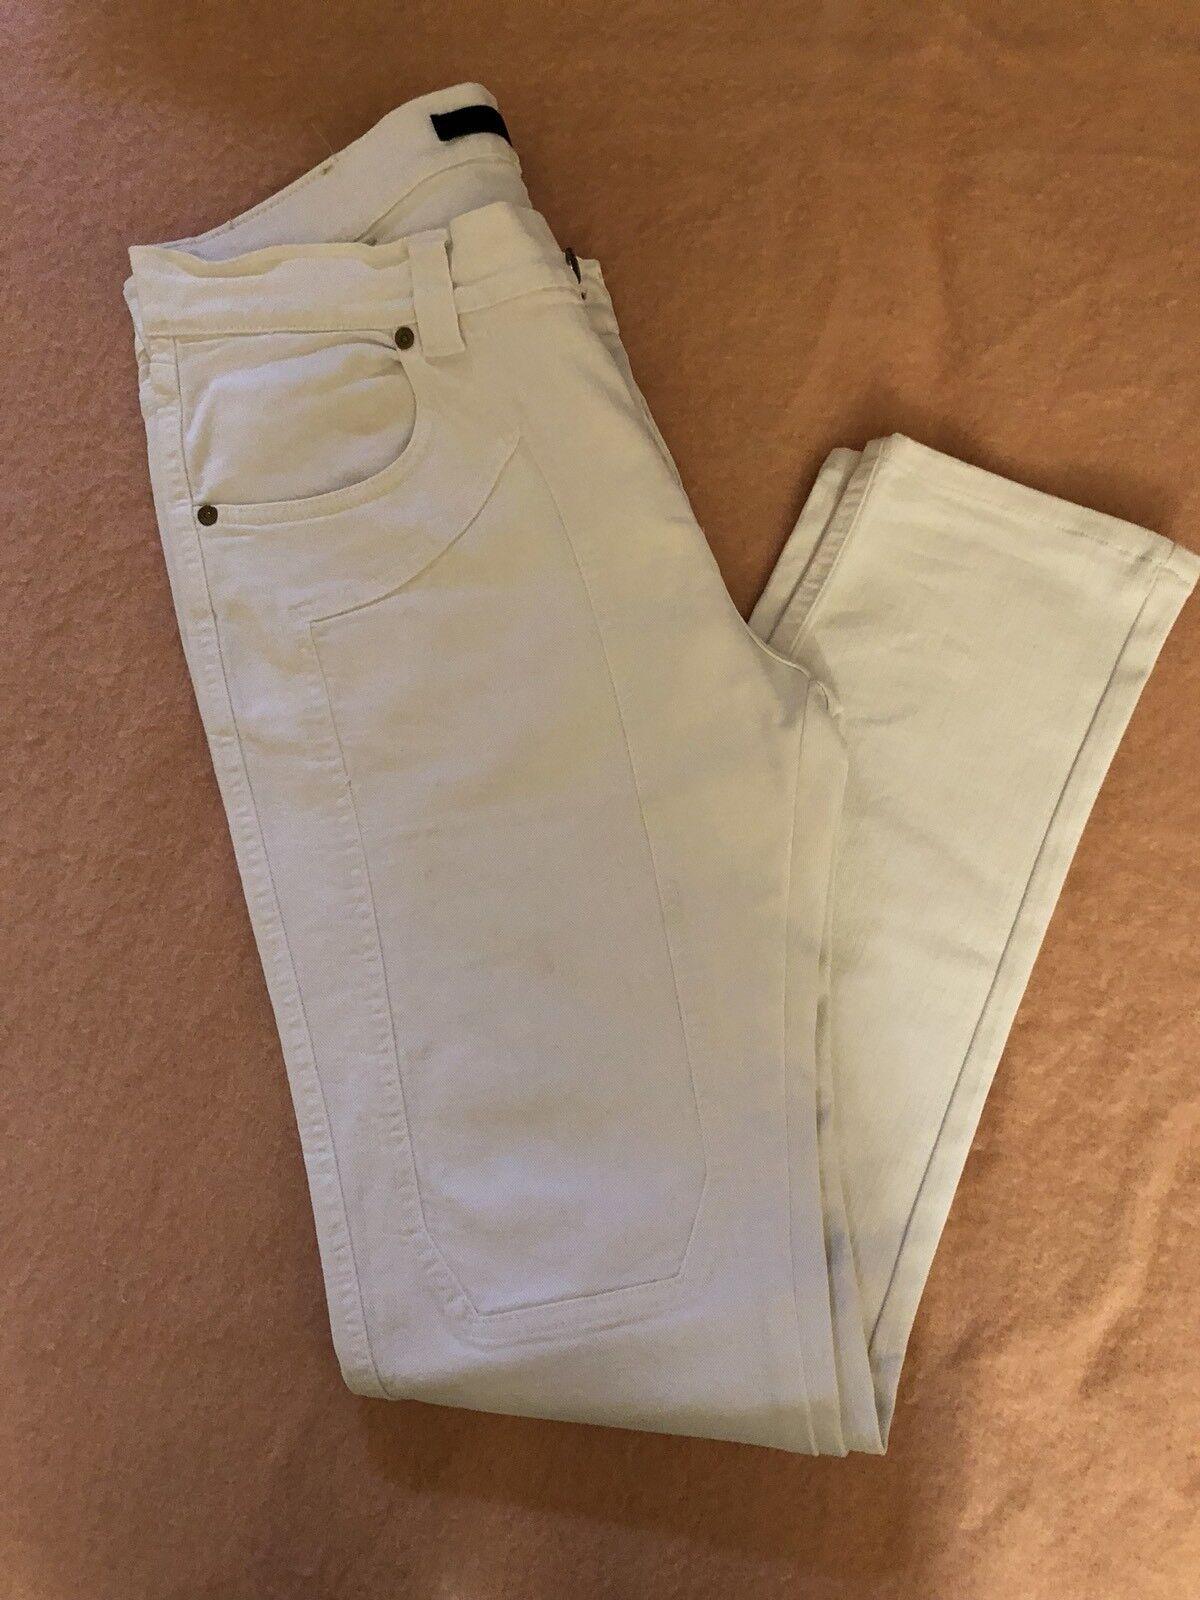 Jeans Pantalone Fifty Four uomo CRANK J341 LAV F skinny fit 30 36 N-8-MARLBT